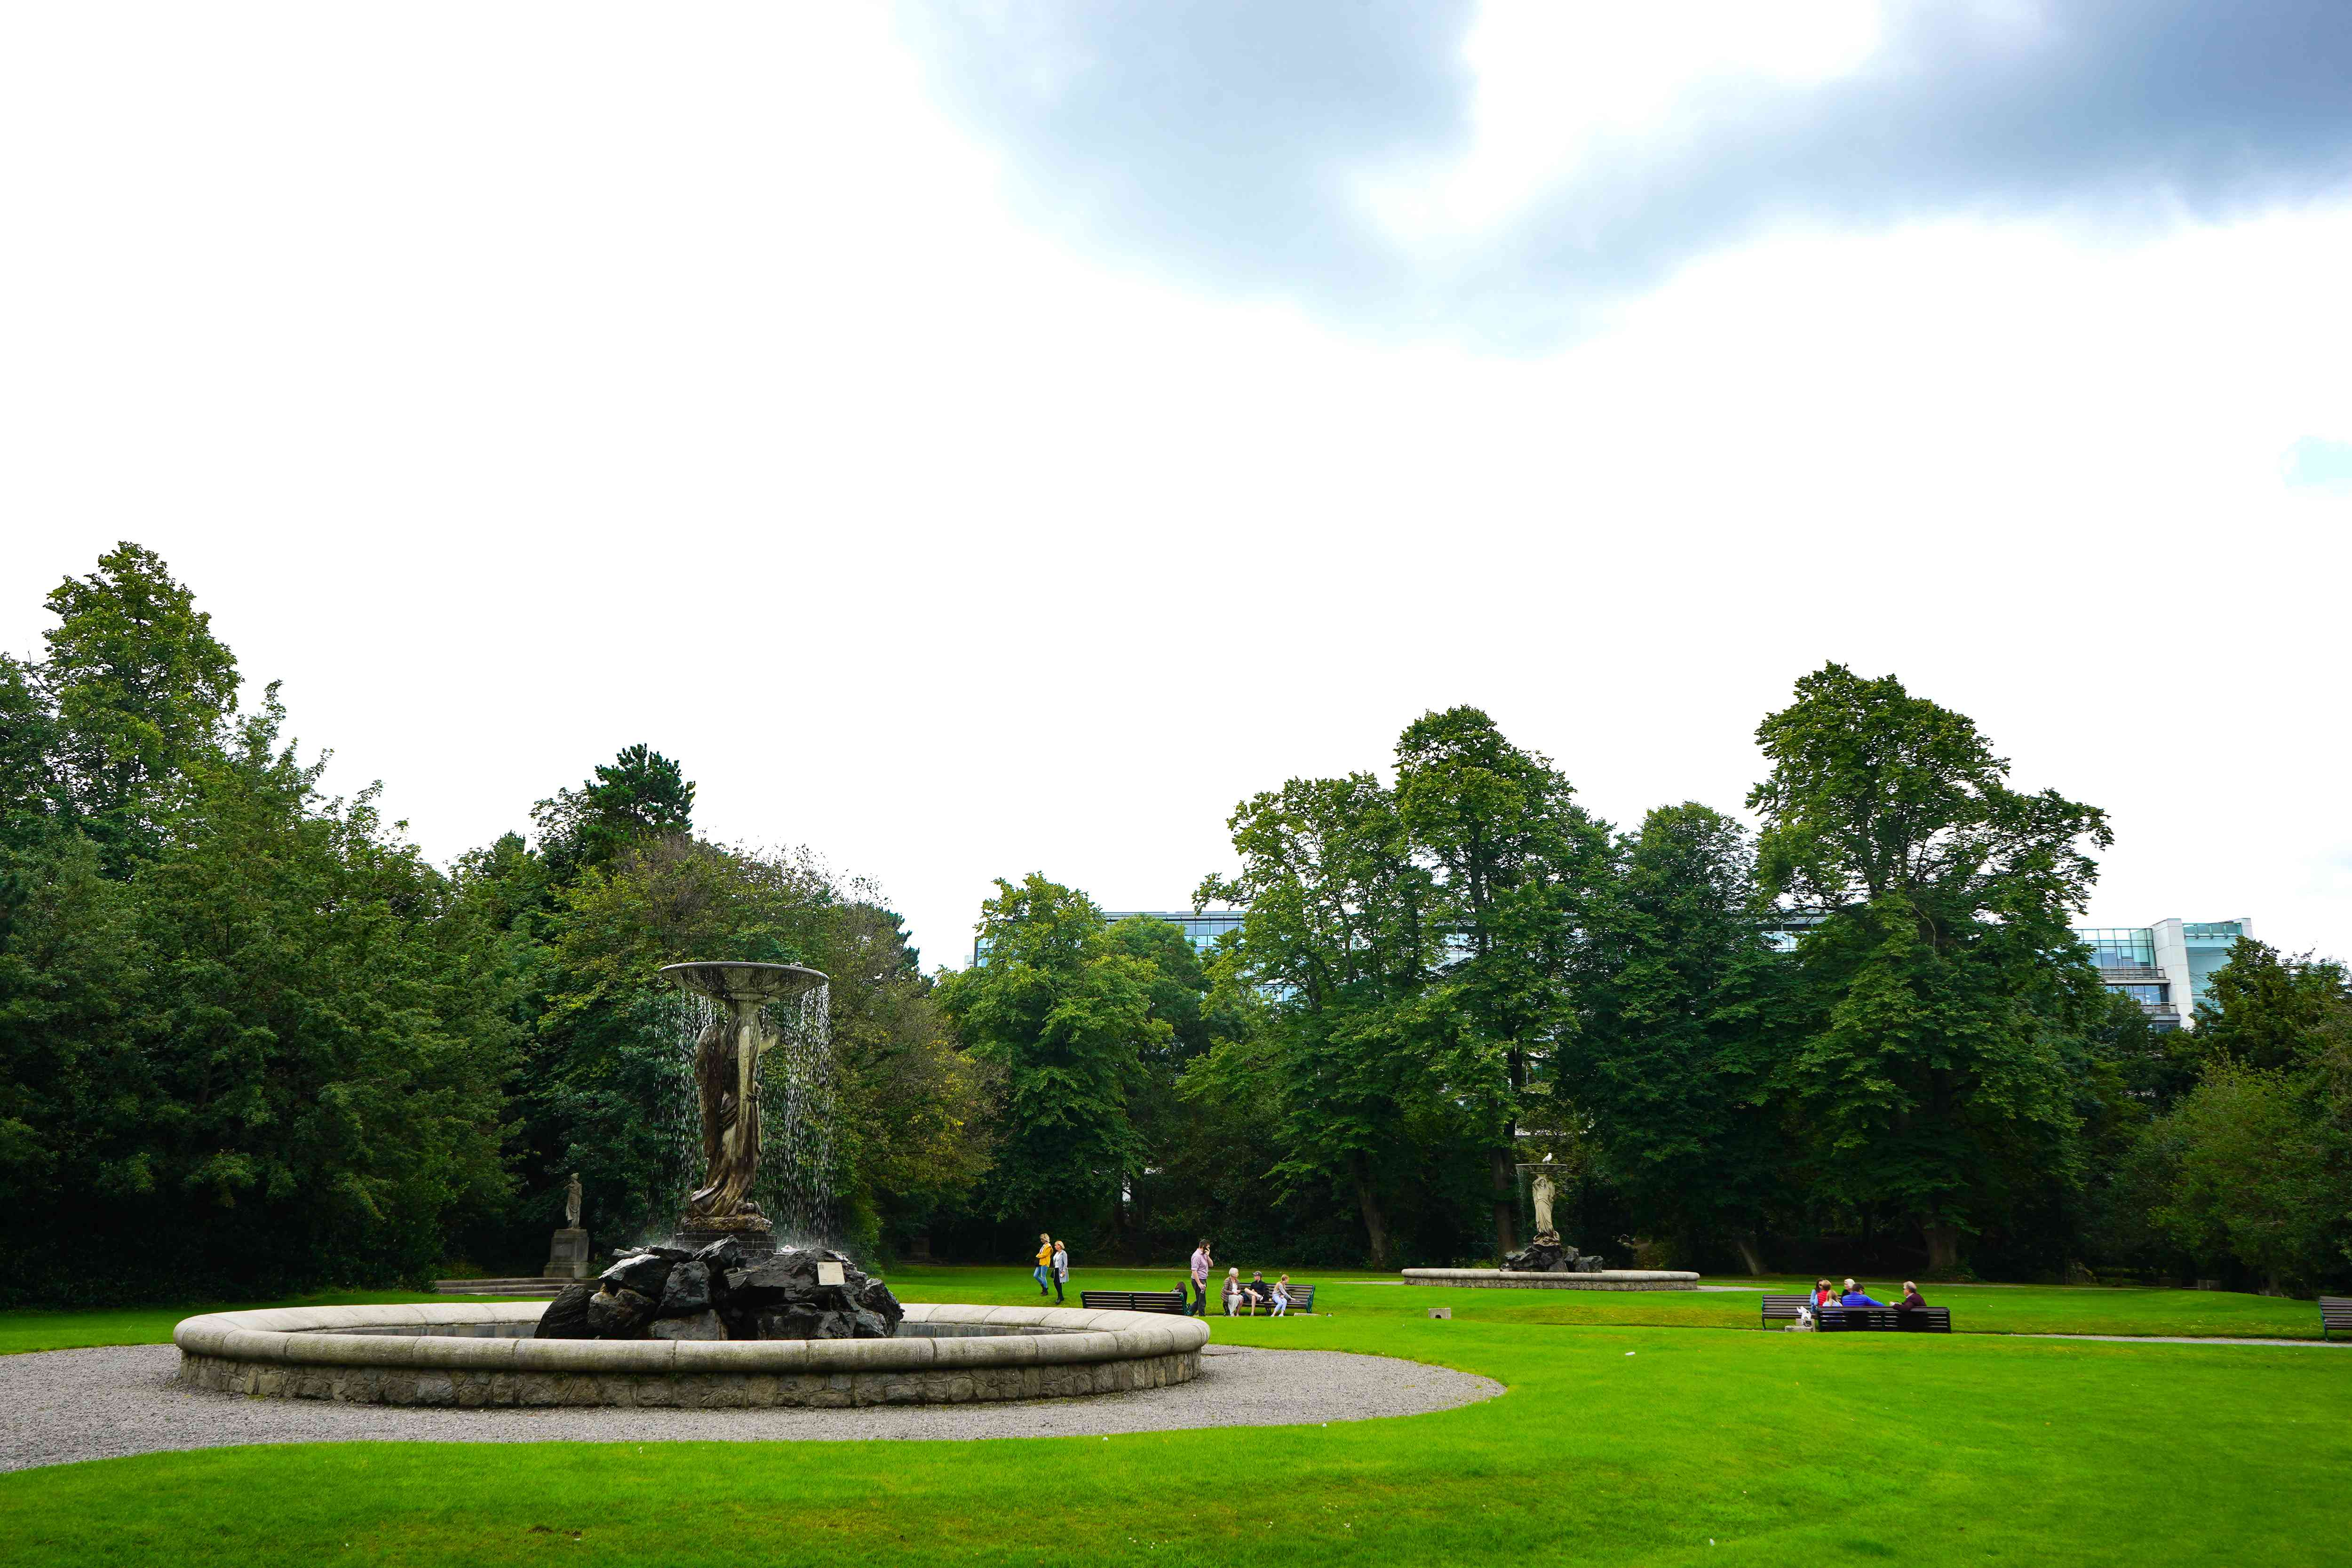 Iveagh Gardens in Dublin, Ireland